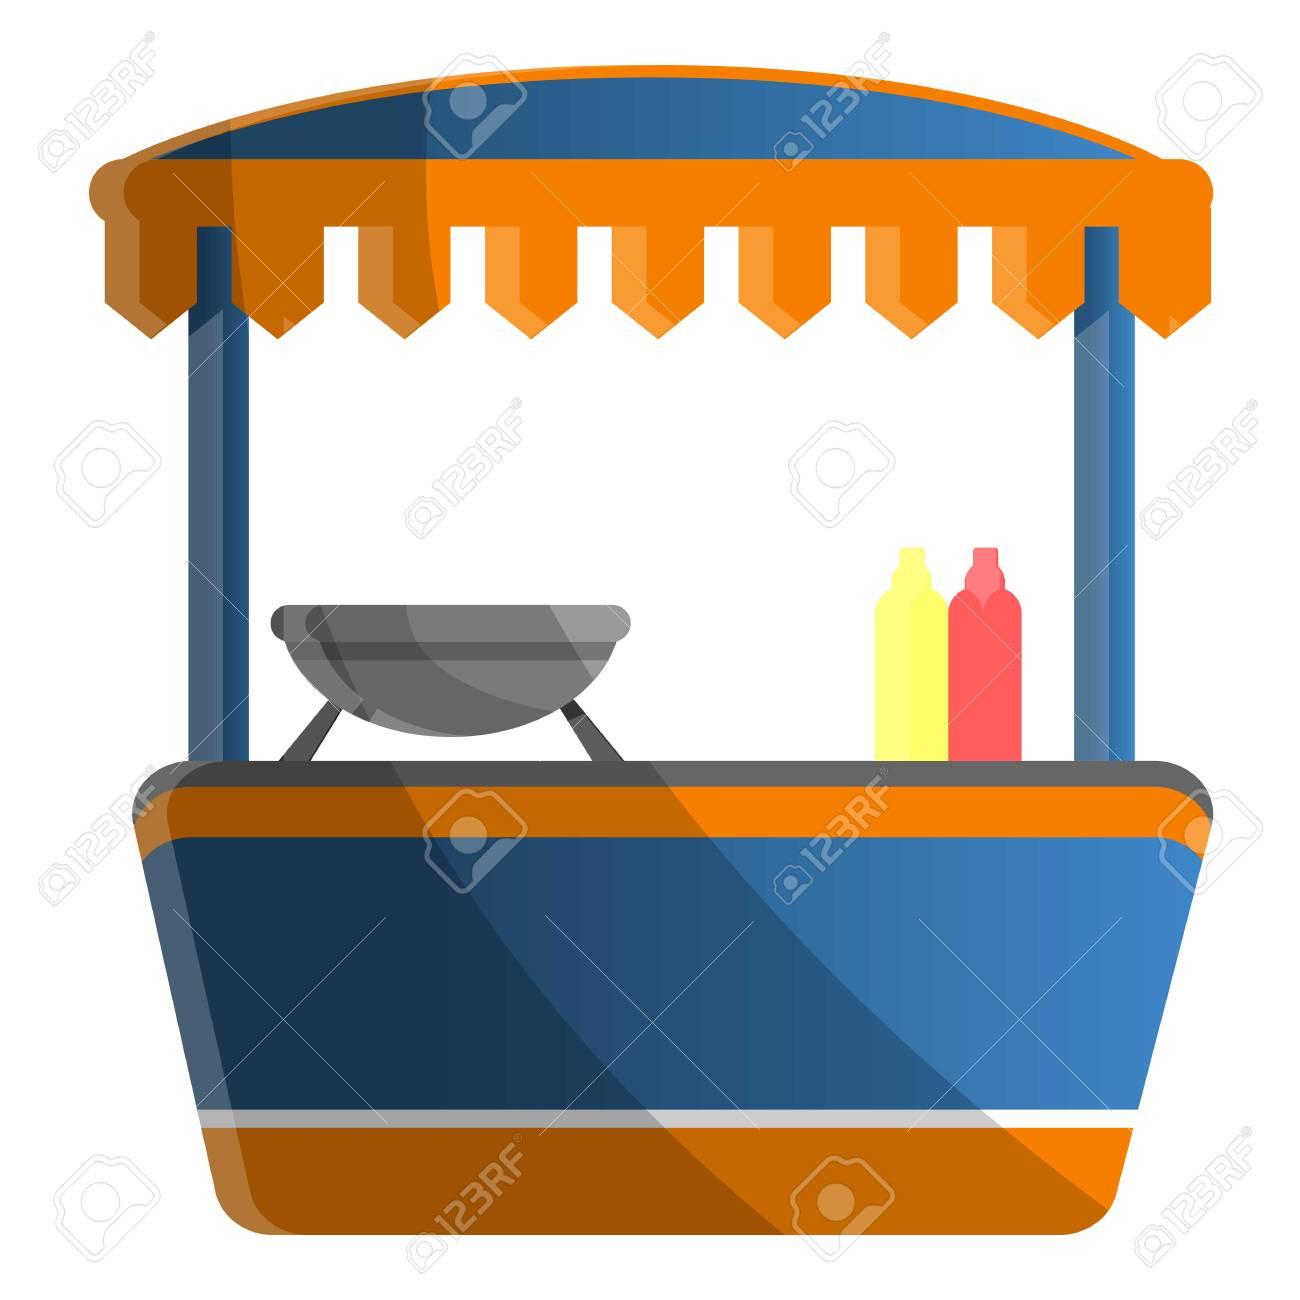 Hot dog kiosk icon  Cartoon of hot dog kiosk icon for web design